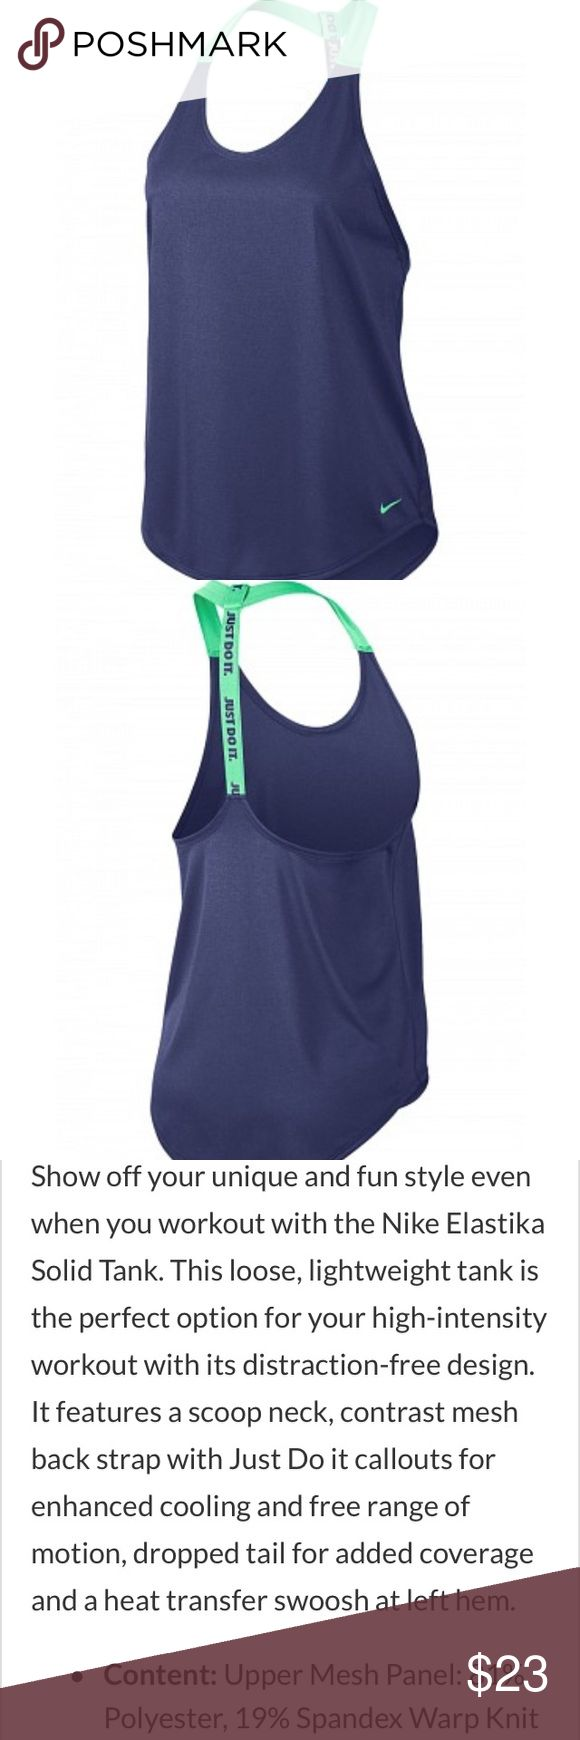 Nike women's winter Elastika tank top Brand new with tags. Color: dark purple dust w/green glow (508) Nike Tops Tank Tops